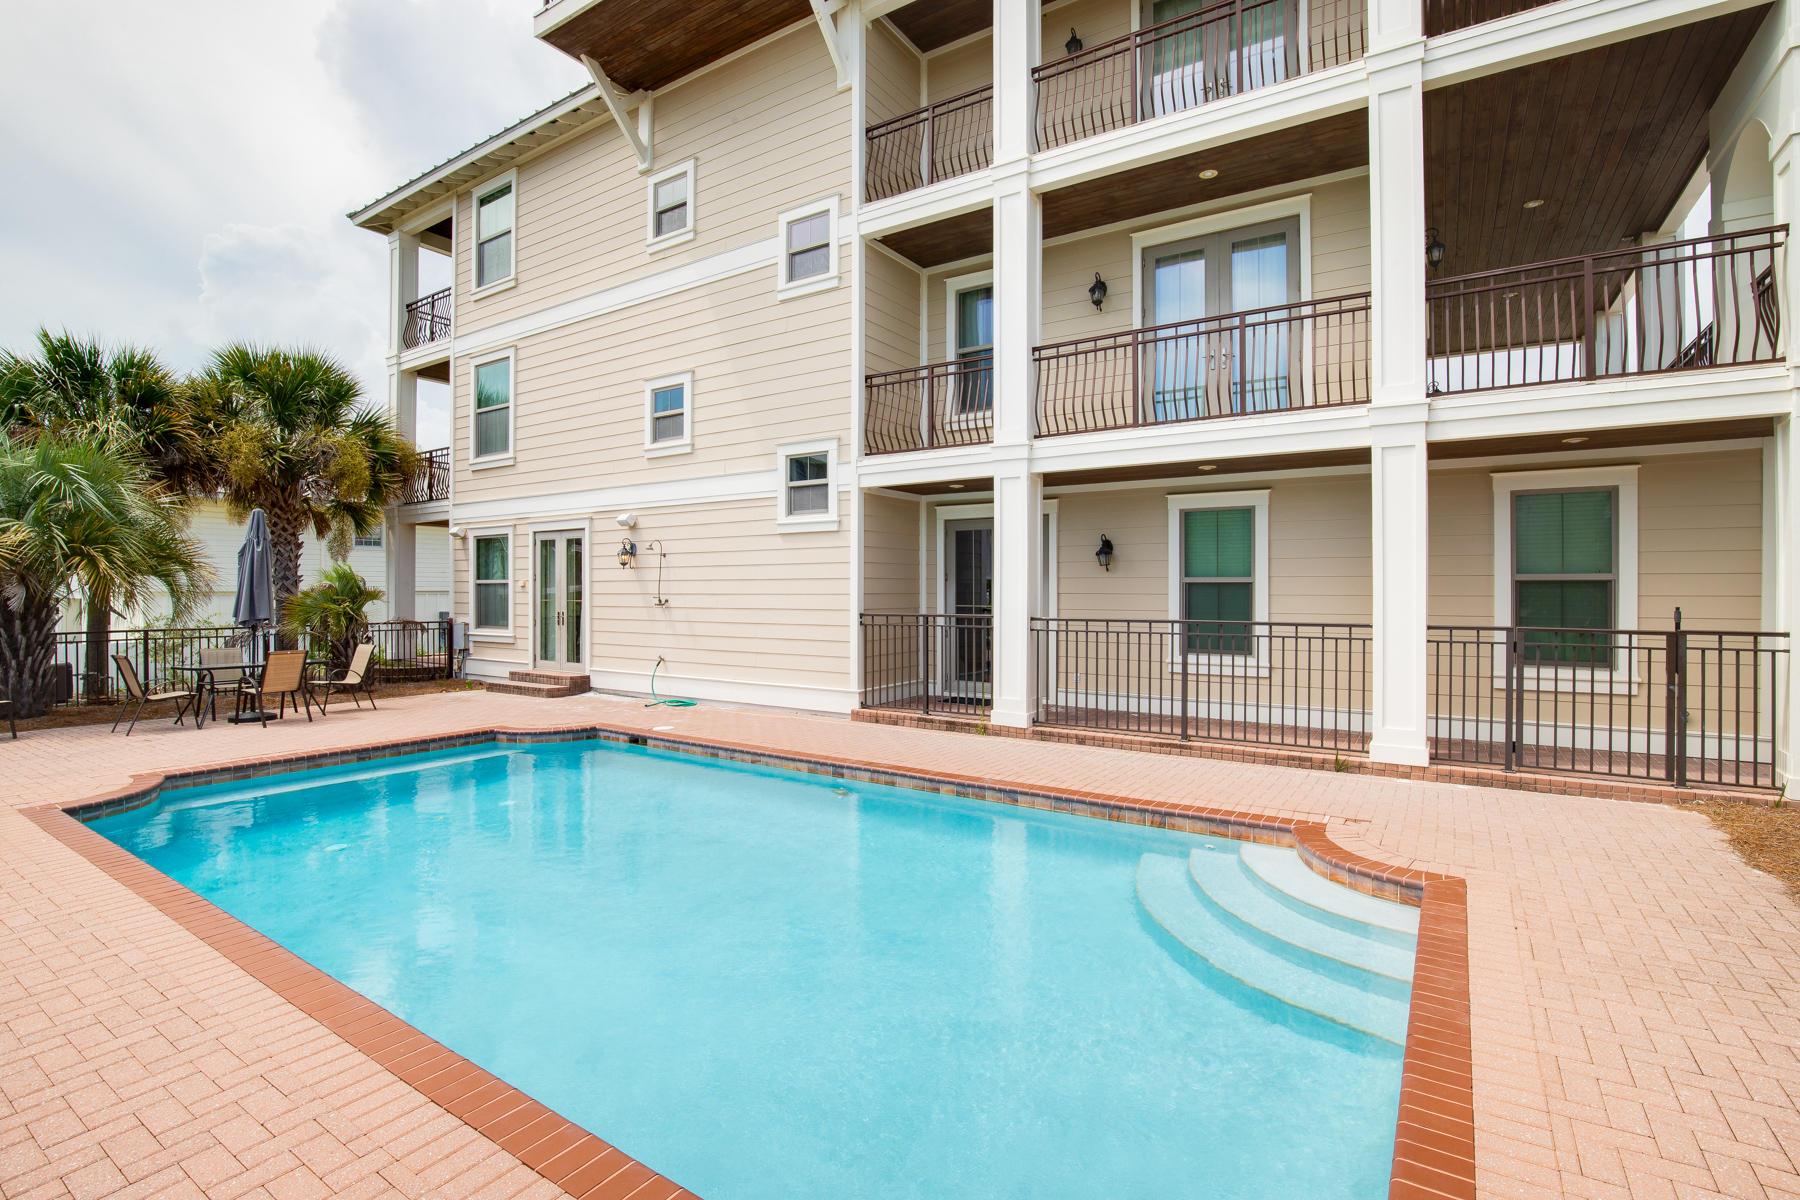 58 Sandy, Santa Rosa Beach, 7 Bedrooms Bedrooms, ,7 BathroomsBathrooms,Detached single family,For Sale,Sandy,856830